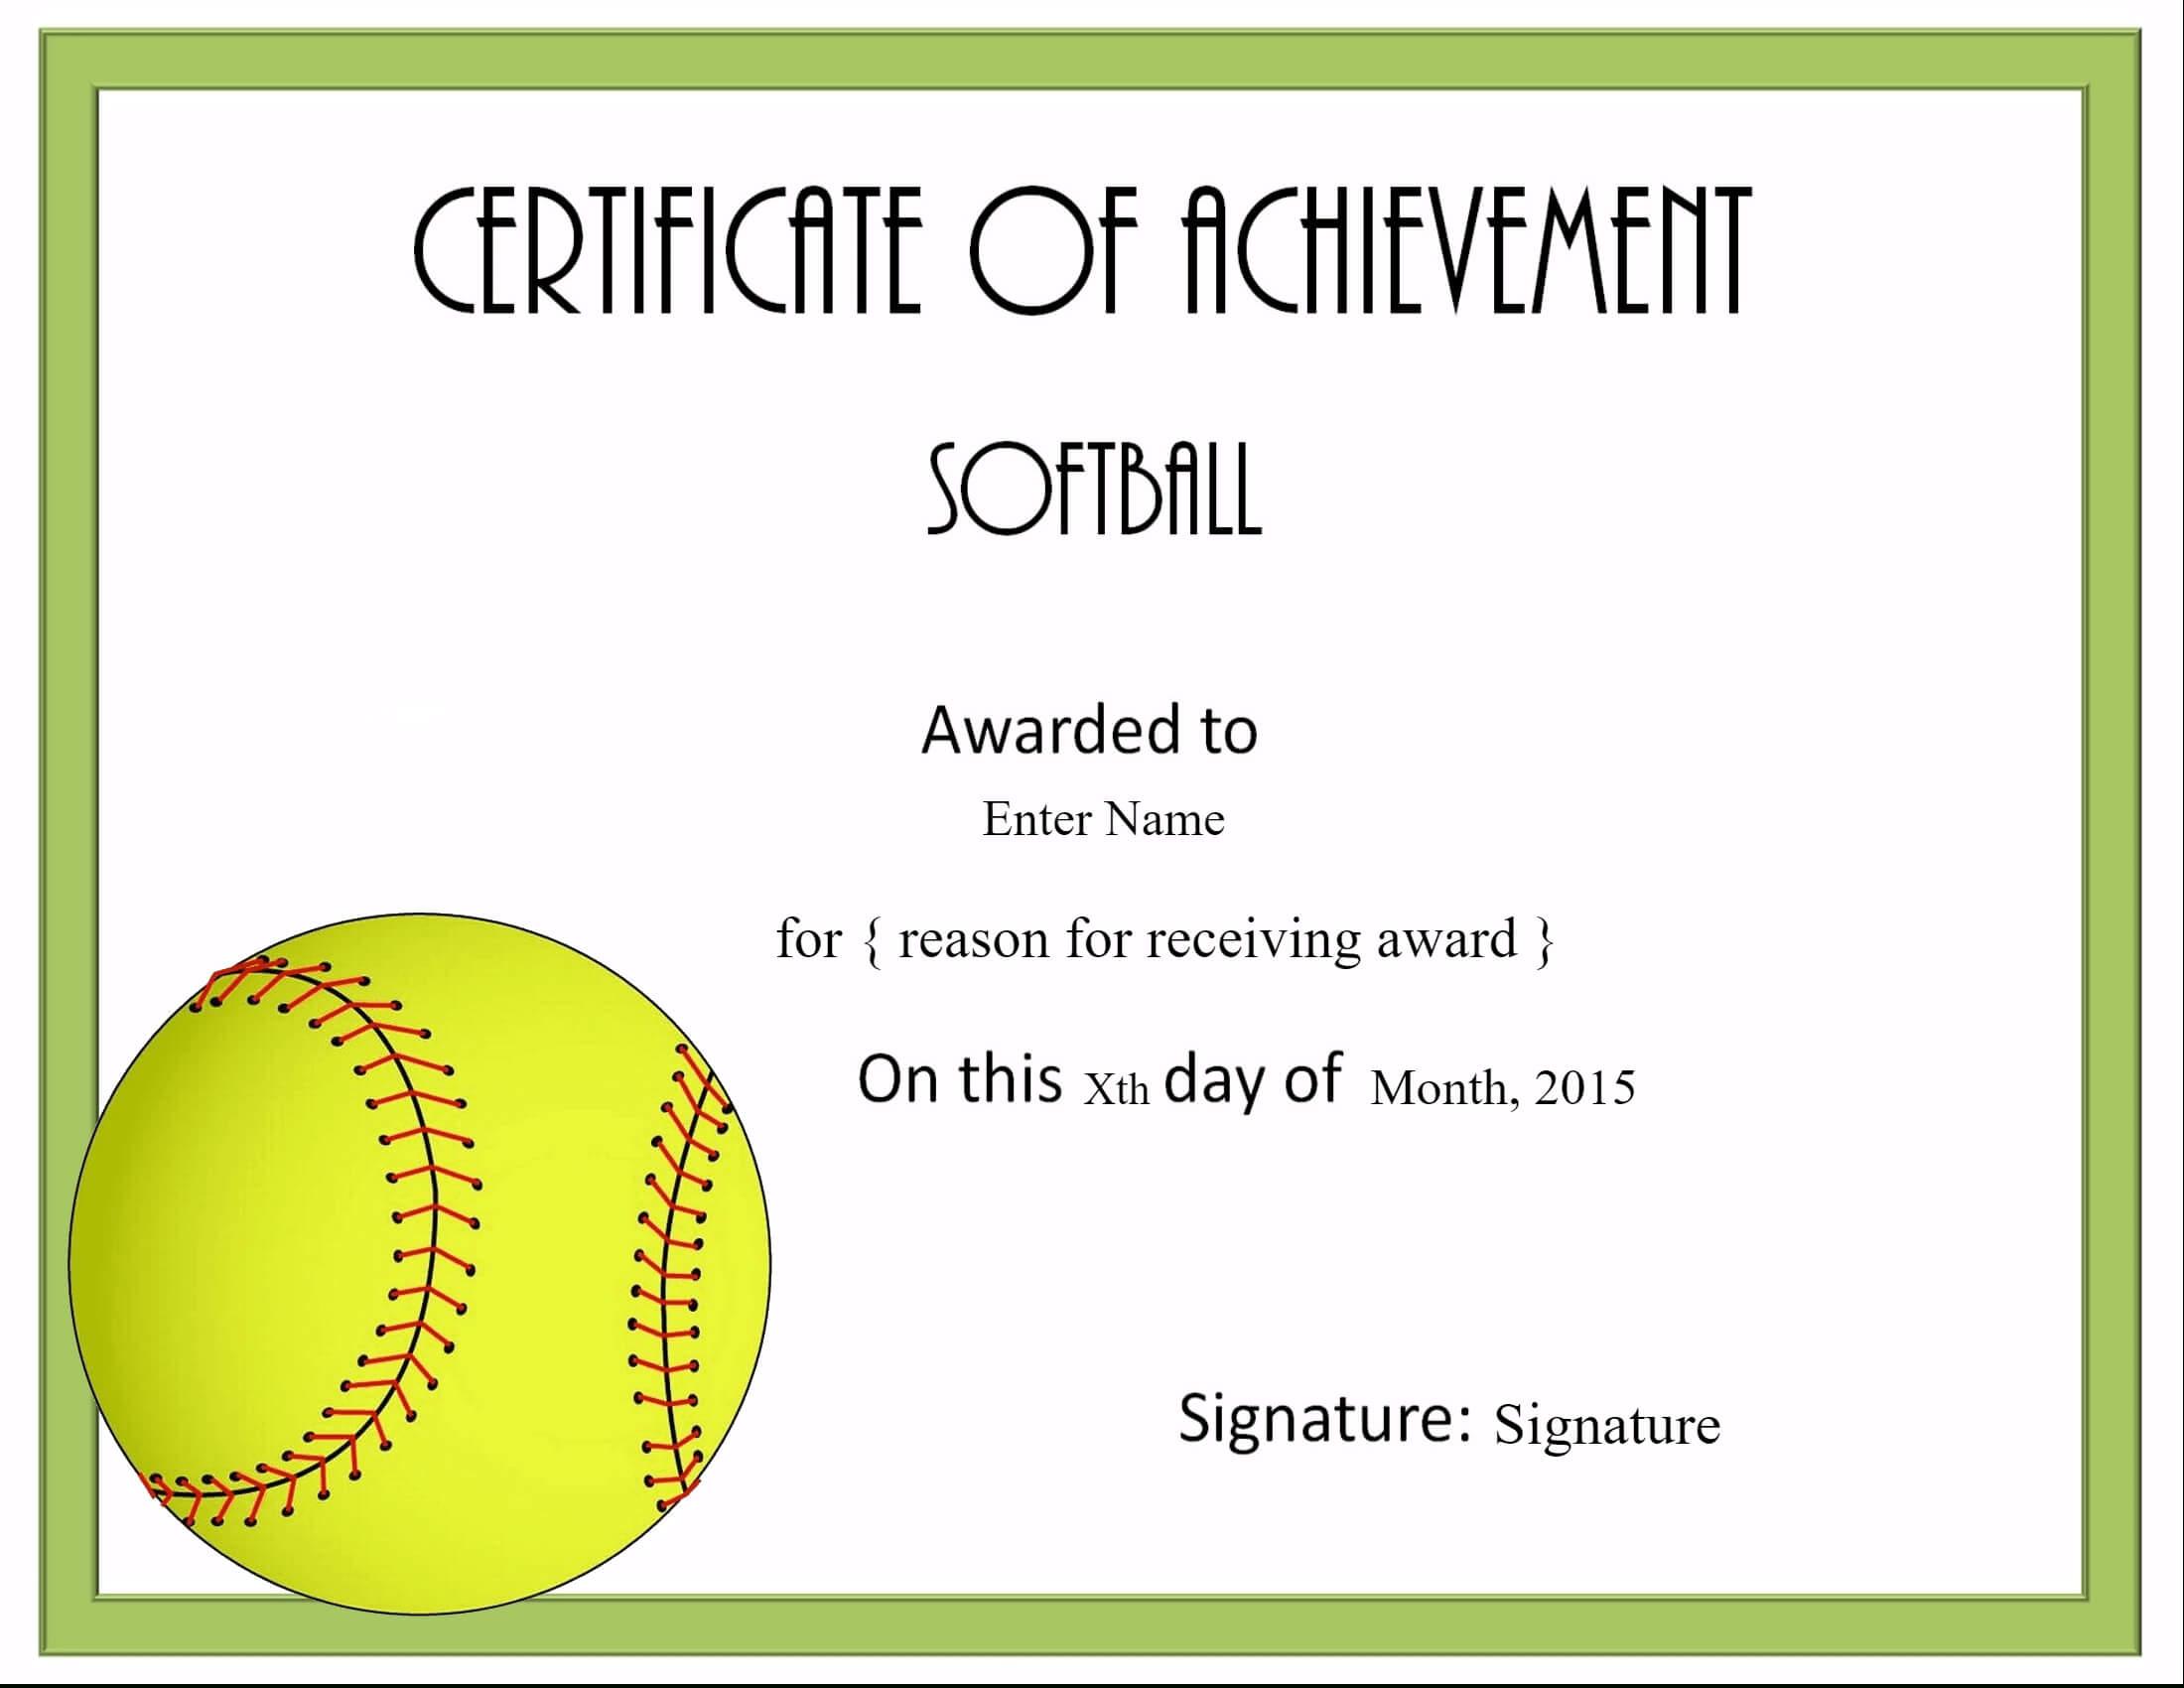 Free Softball Certificate Templates - Customize Online For Softball Certificate Templates Free